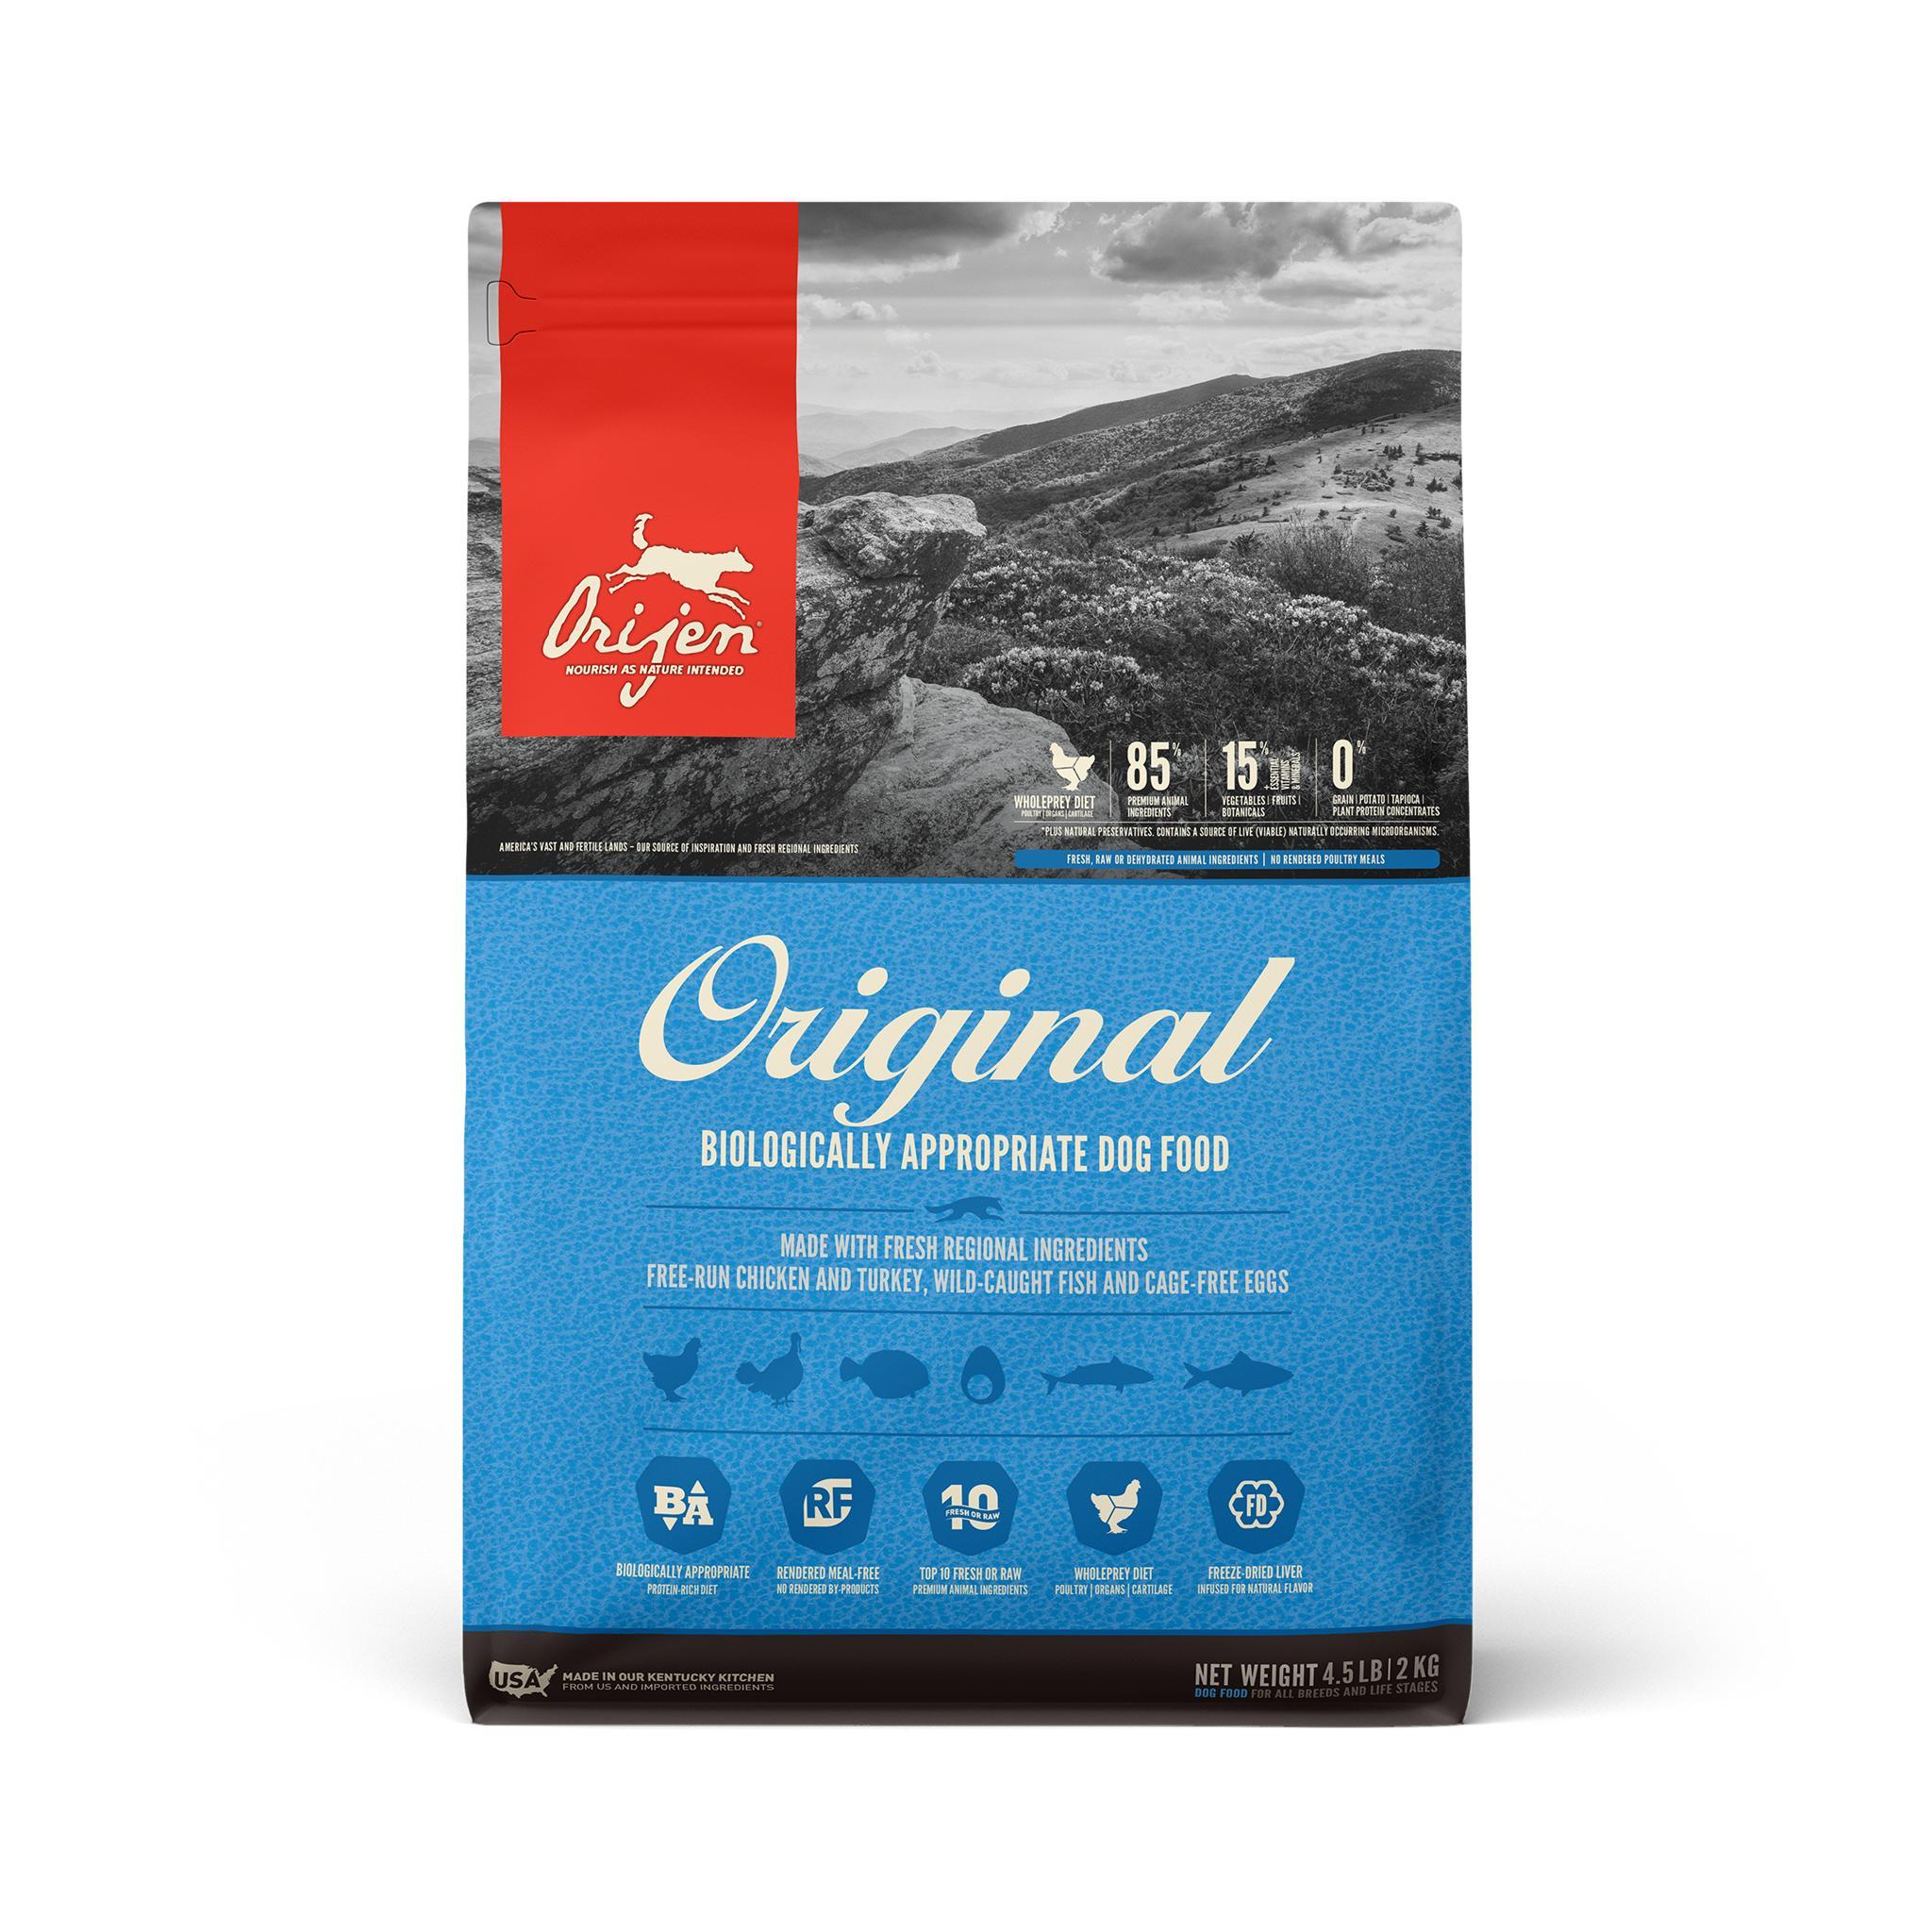 ORIJEN Original Grain-Free Dry Dog Food, 4.5-lb